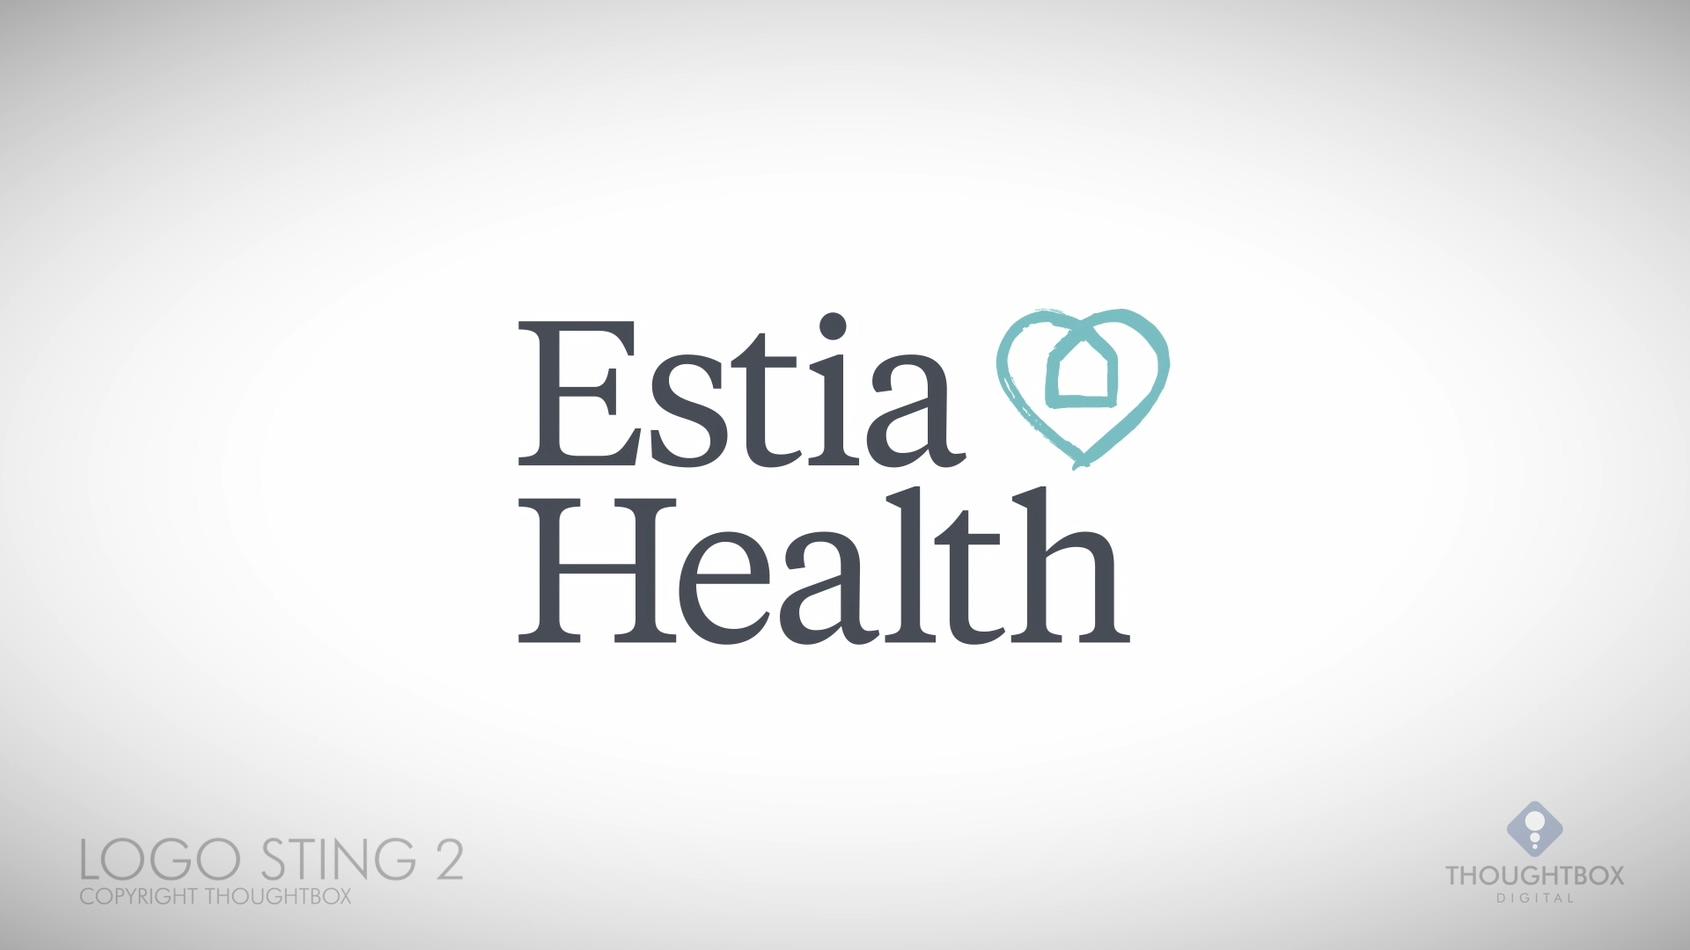 ESTIA-181124-Estia Logo Animation Showreel-v001-CB.mp4_20181124_170122.065.jpg